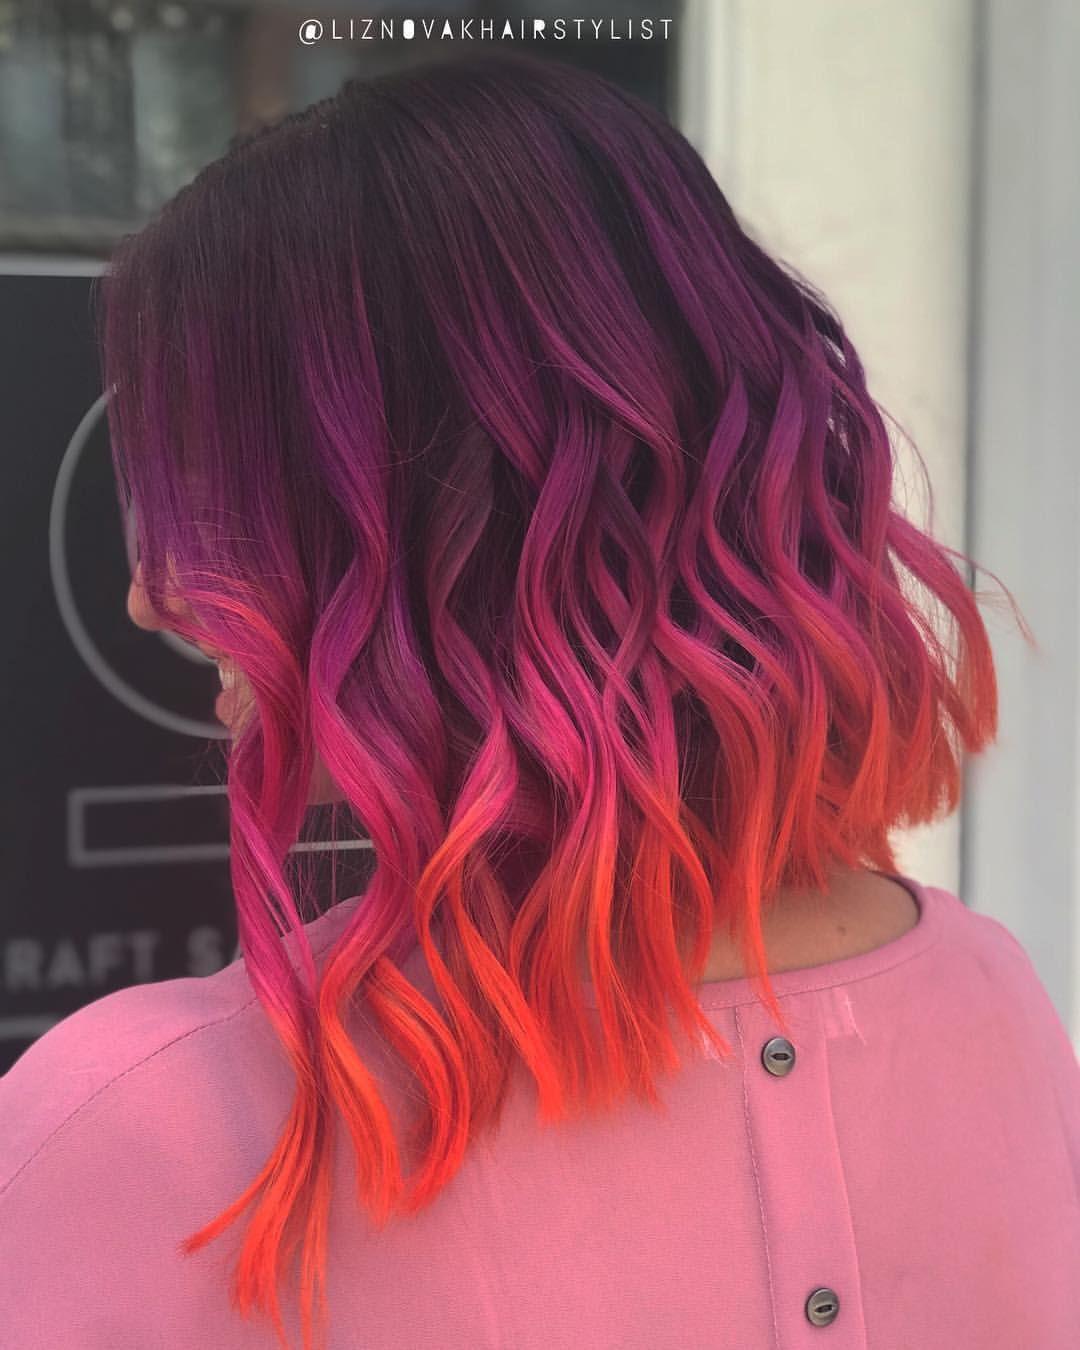 Arctic Fox Hair Color- Vegan & Cruelty-Free